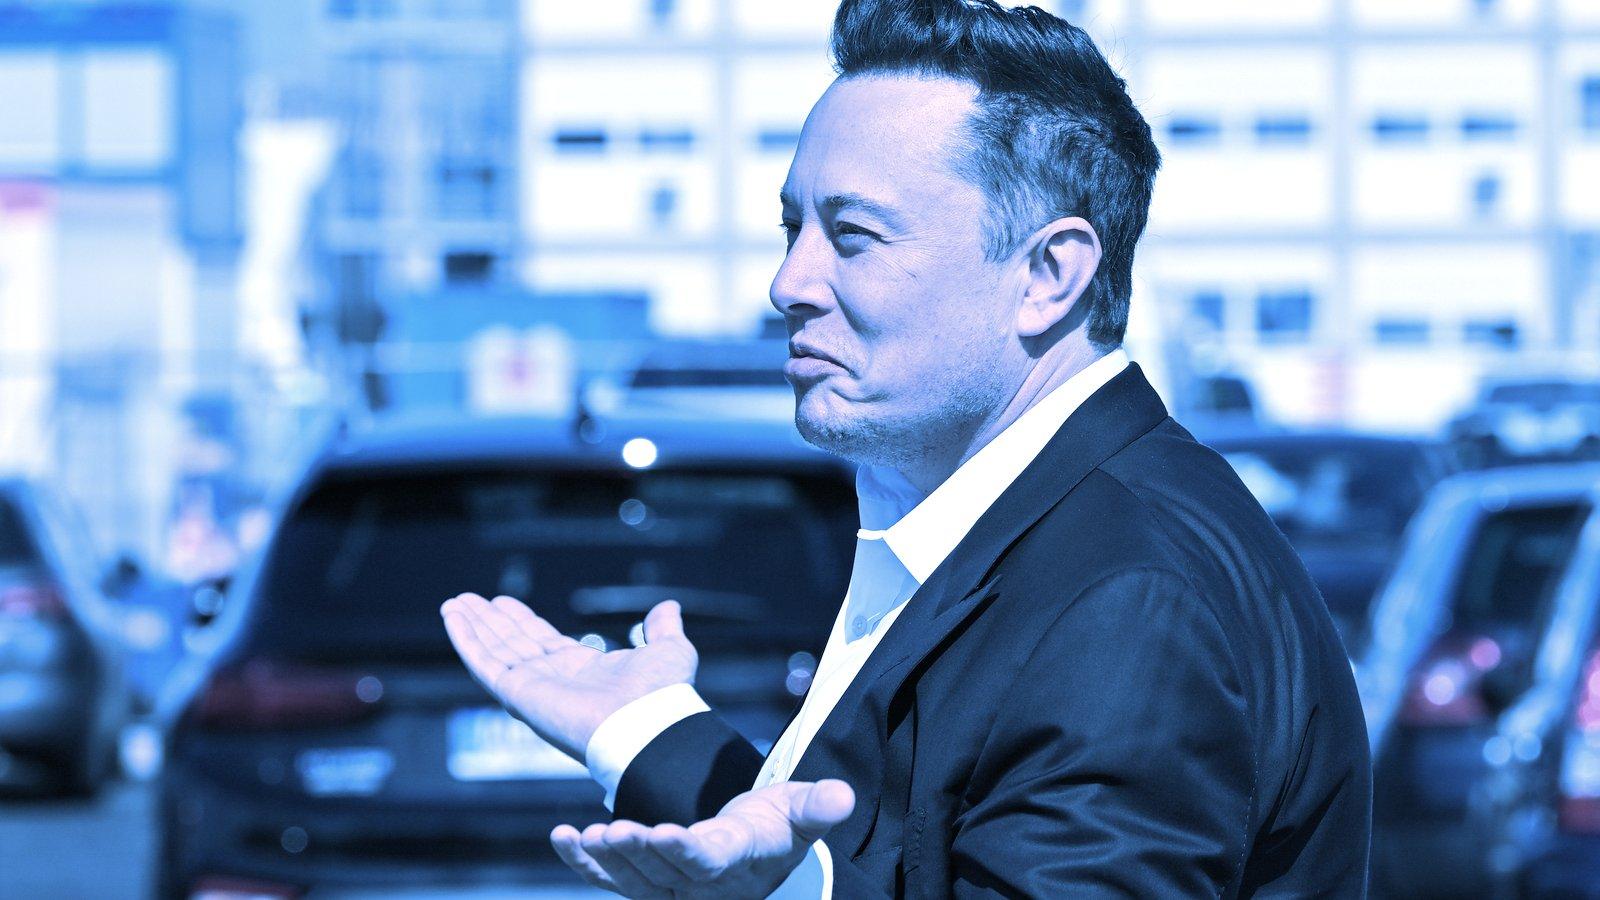 Elon Musk Tweets That Tesla Has Diamond Hands, Cushioning Bitcoin Slide